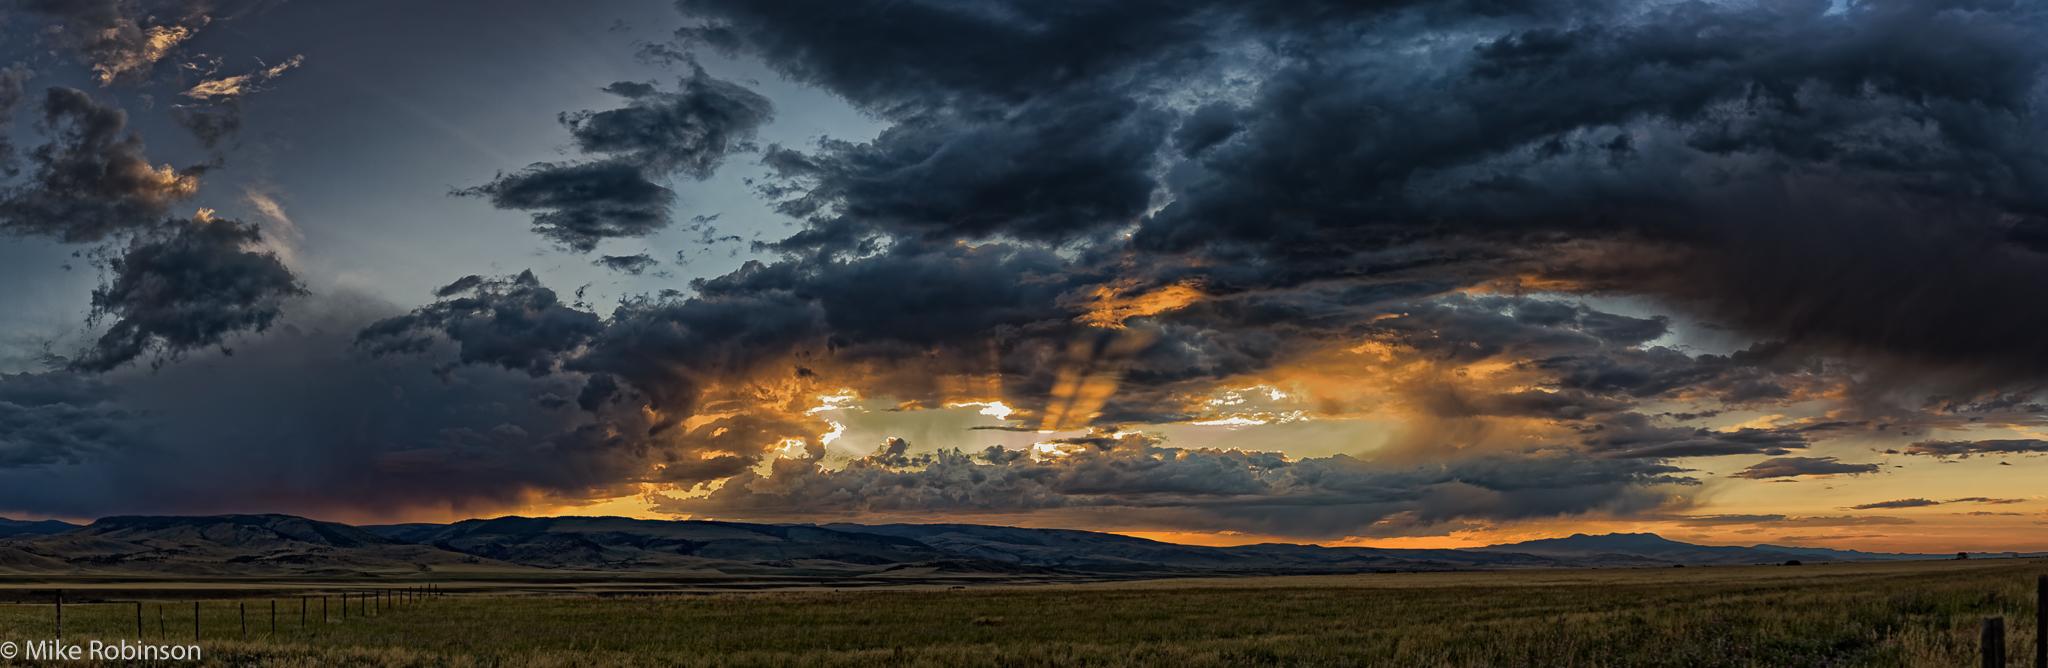 Pano_Cameron_Summer_Sunset_2